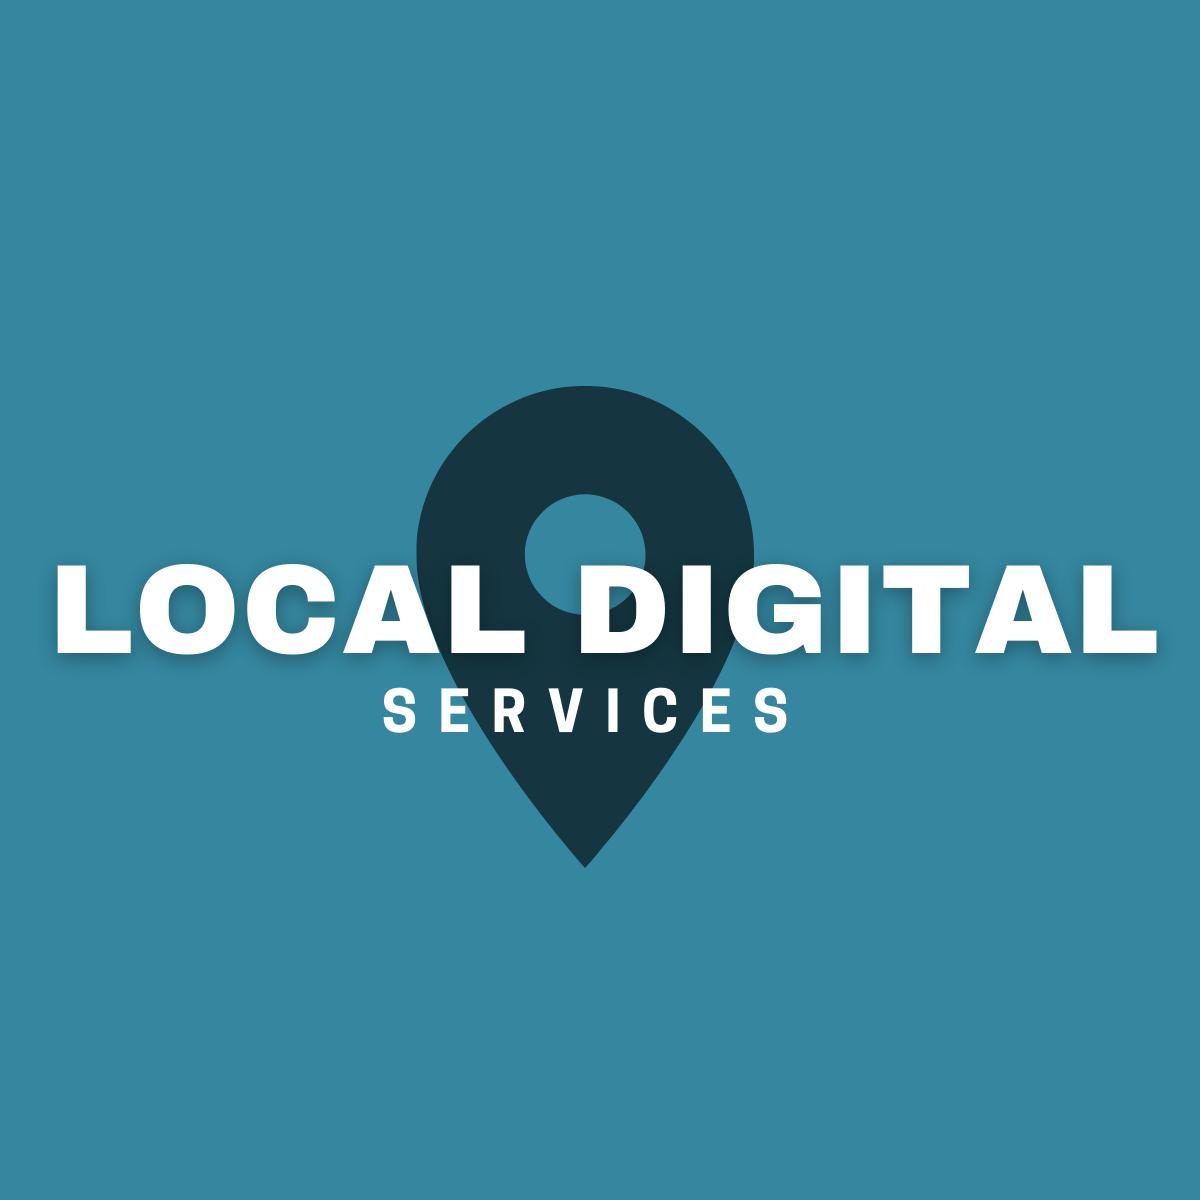 Local Digital Services